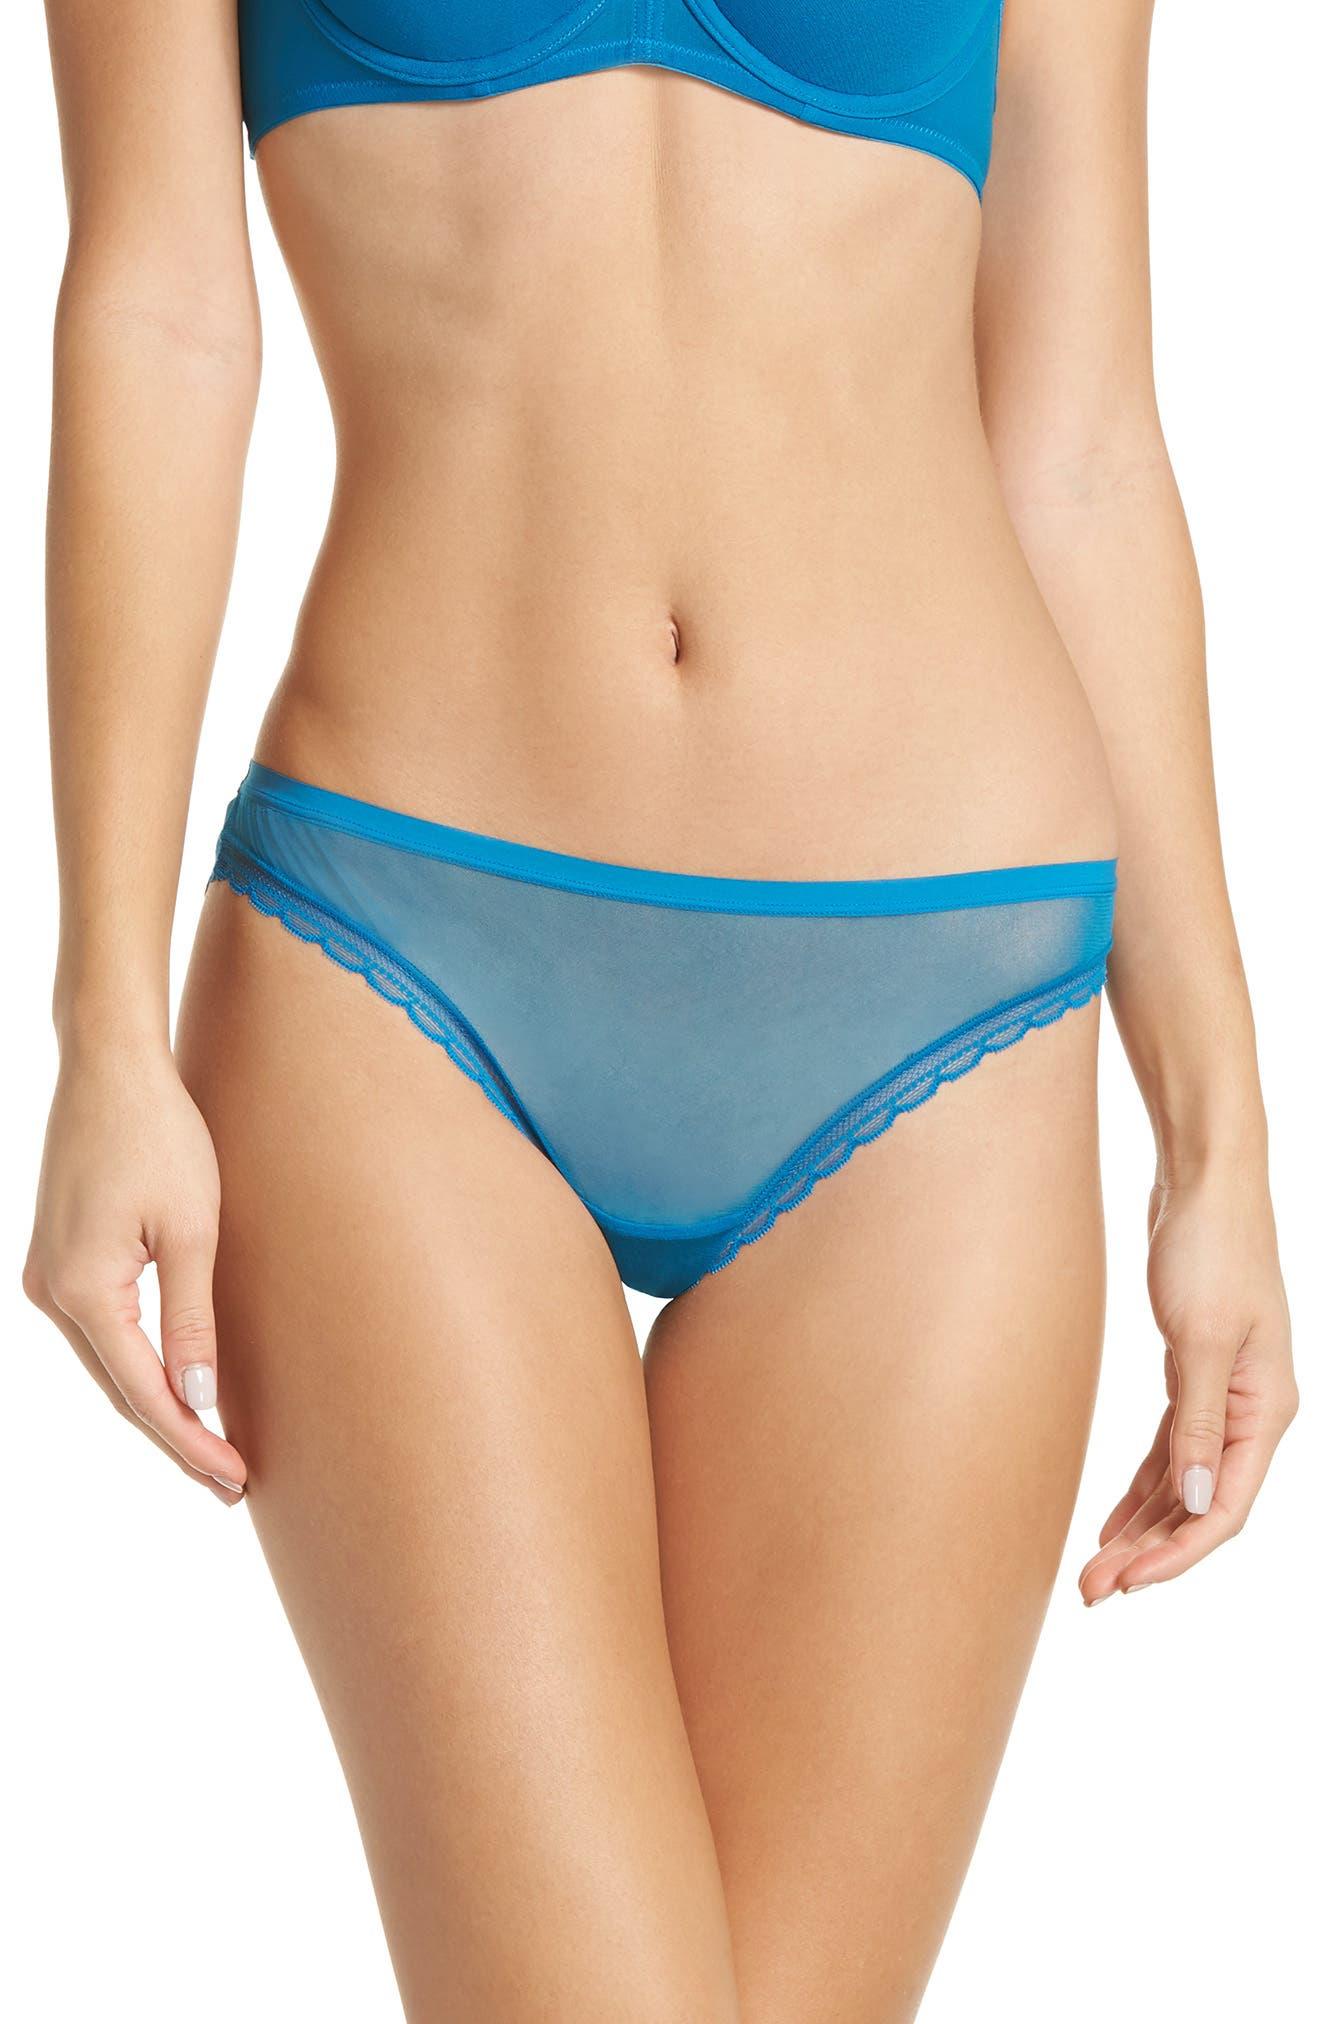 Mesh Bikini,                         Main,                         color, DEEP TOPAZ